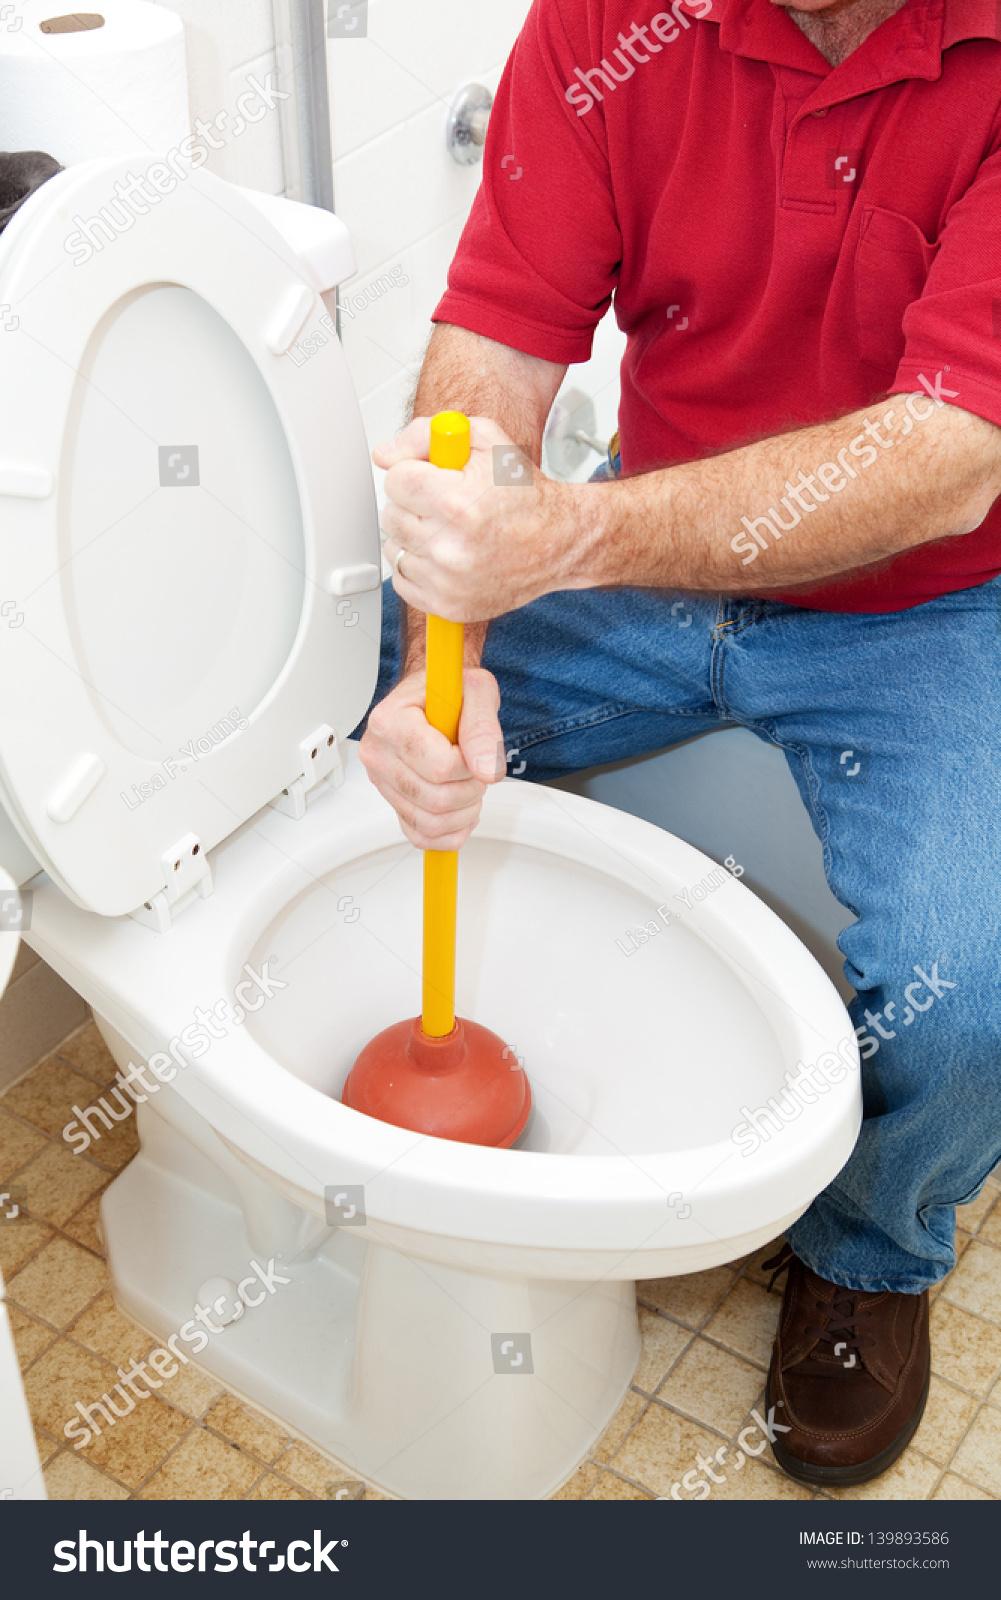 plumber homeowner using plunger unclog toilet stock photo 139893586 shutterstock. Black Bedroom Furniture Sets. Home Design Ideas